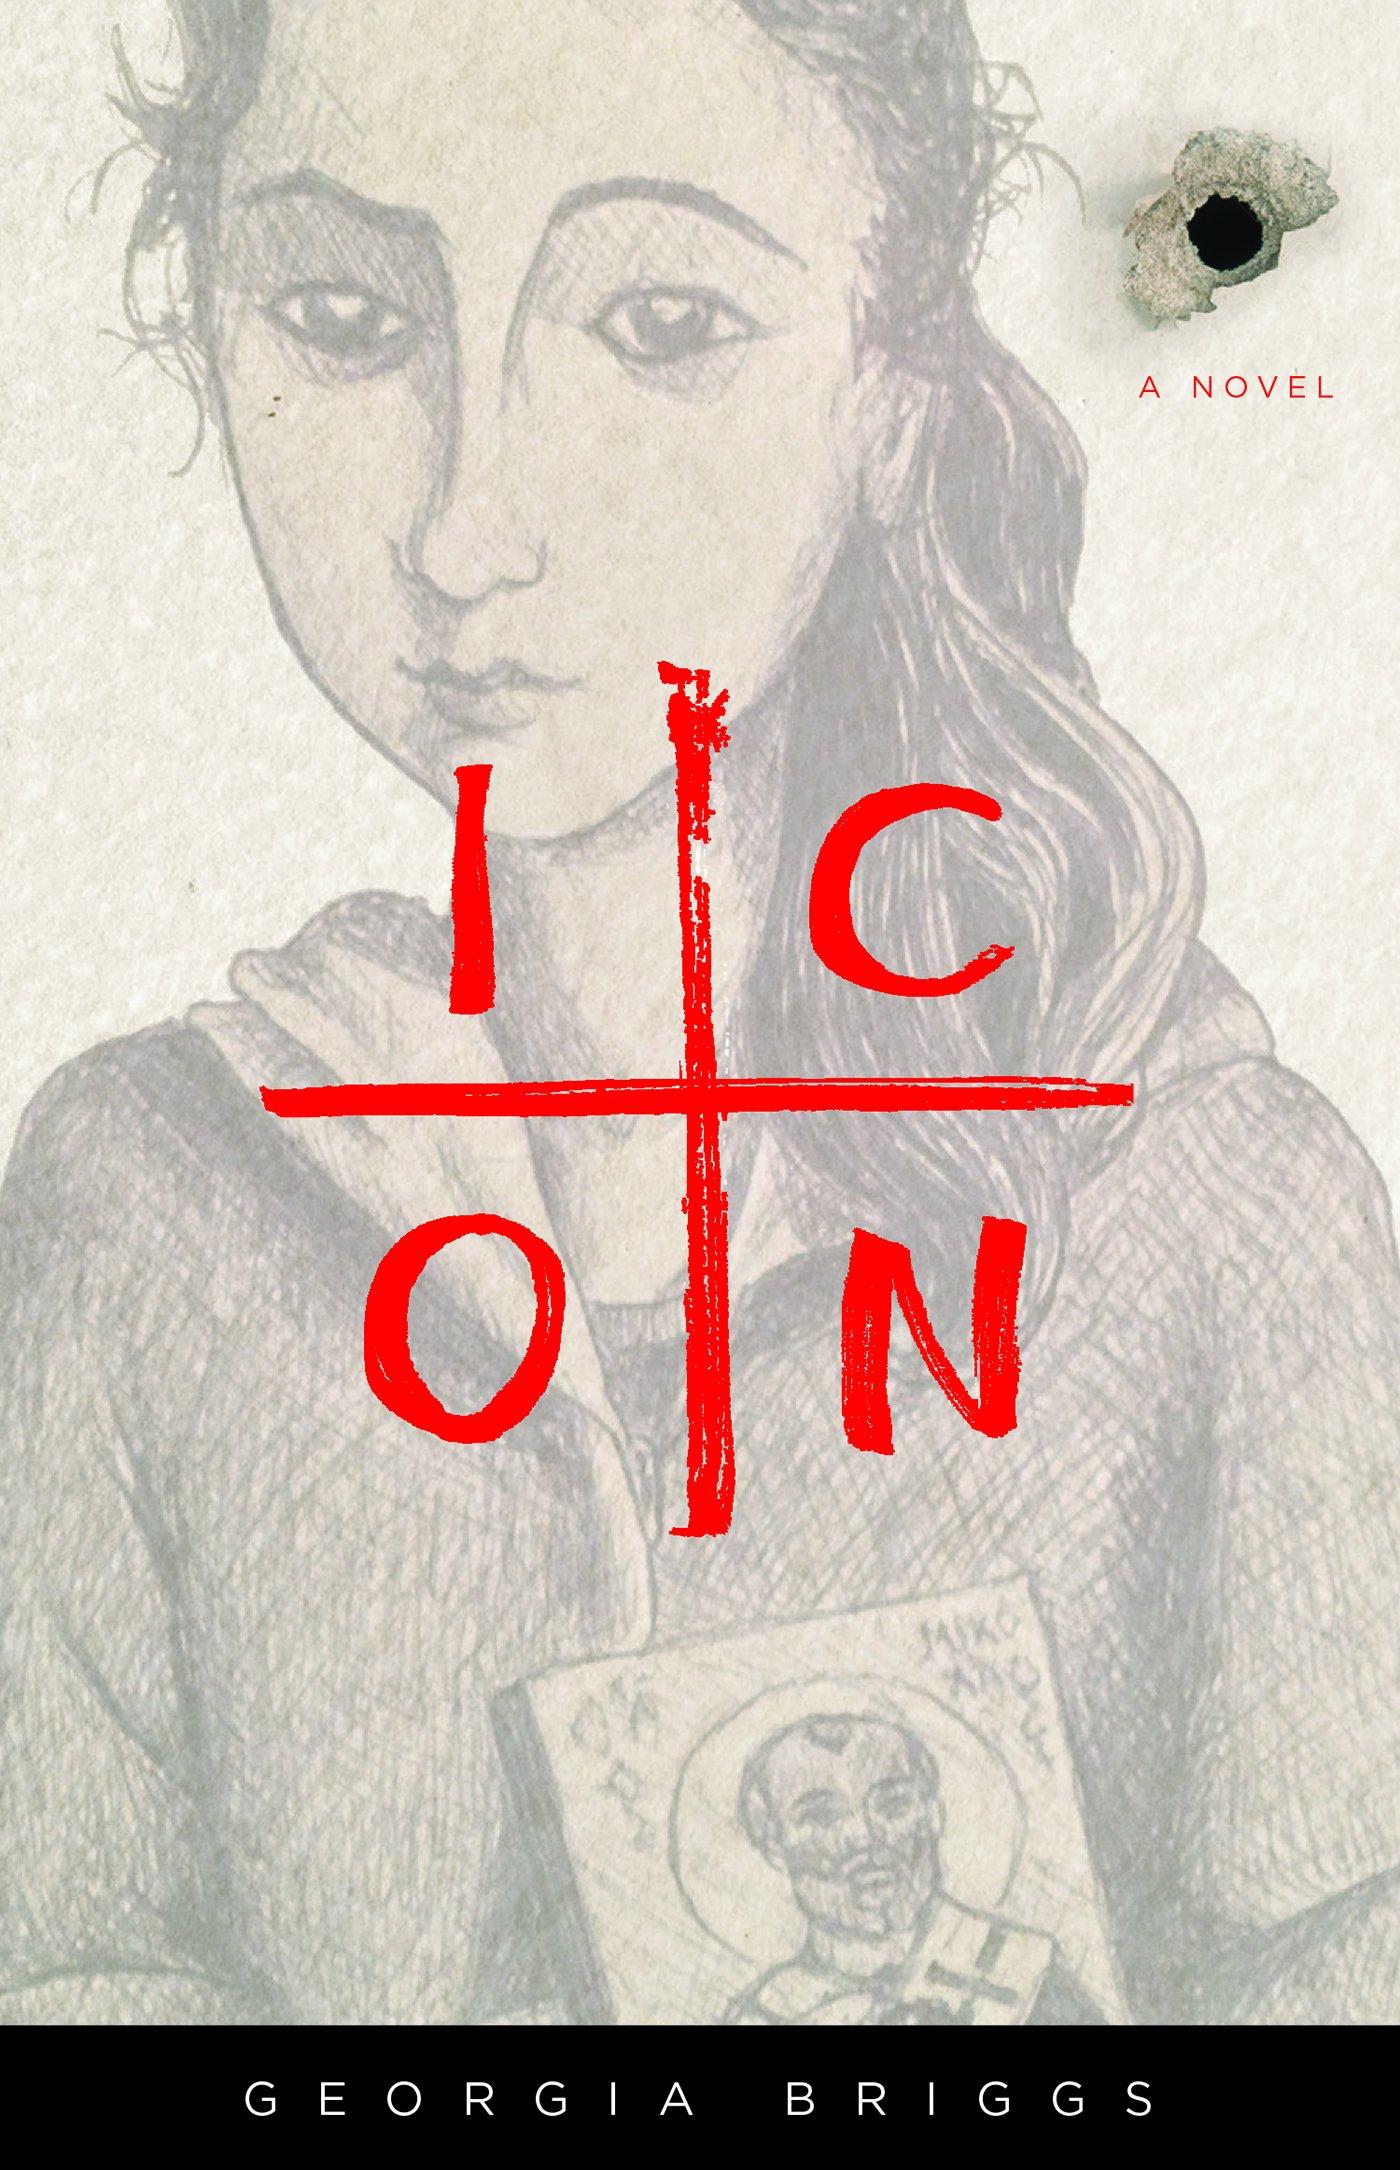 Icon Novel Georgia Briggs product image